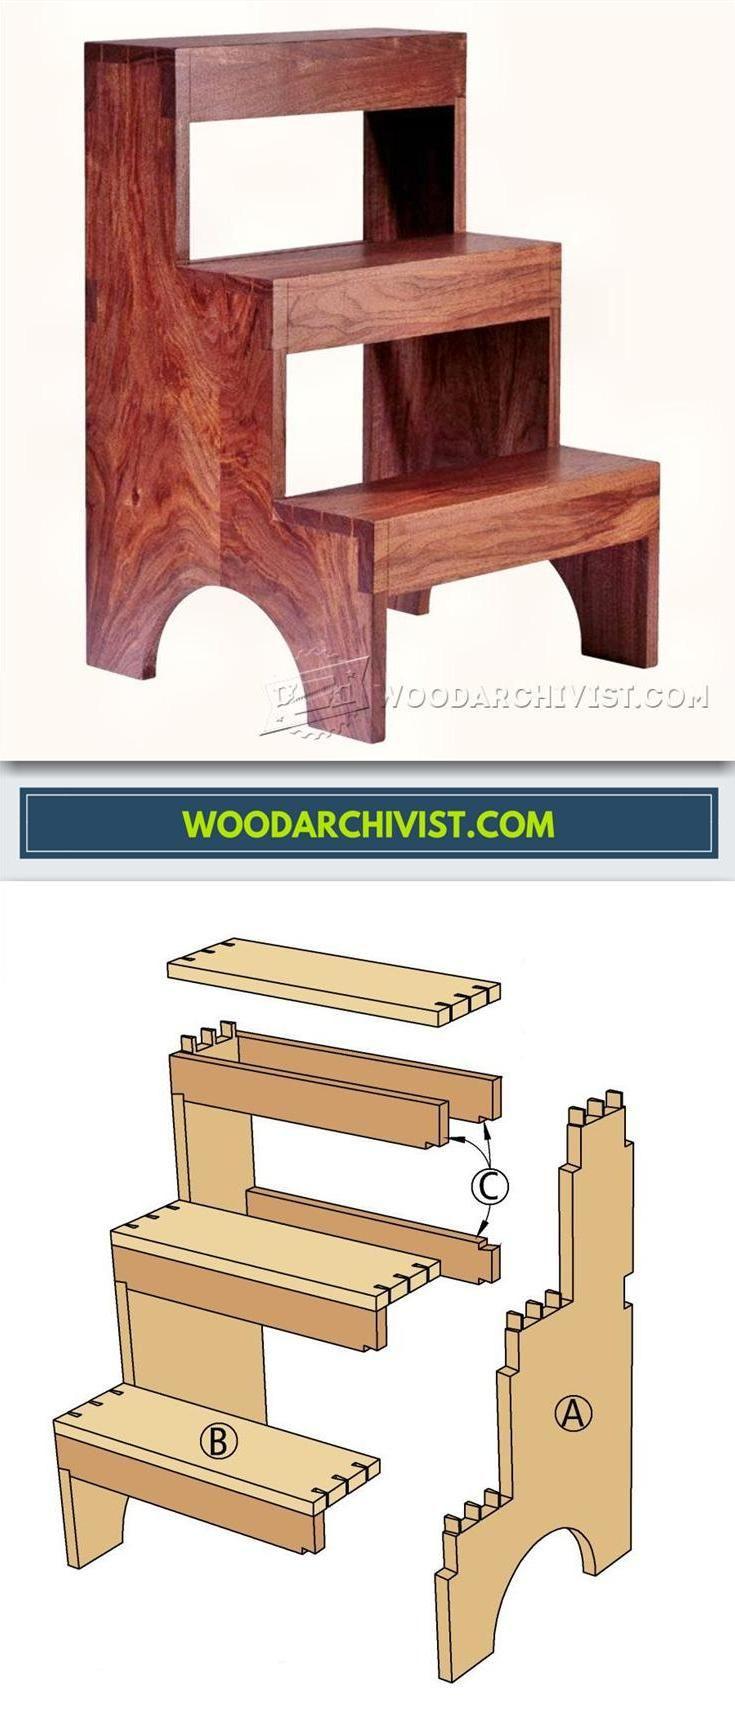 Diy Stepstool Furniture Plans And Projects Woodarchivist Com